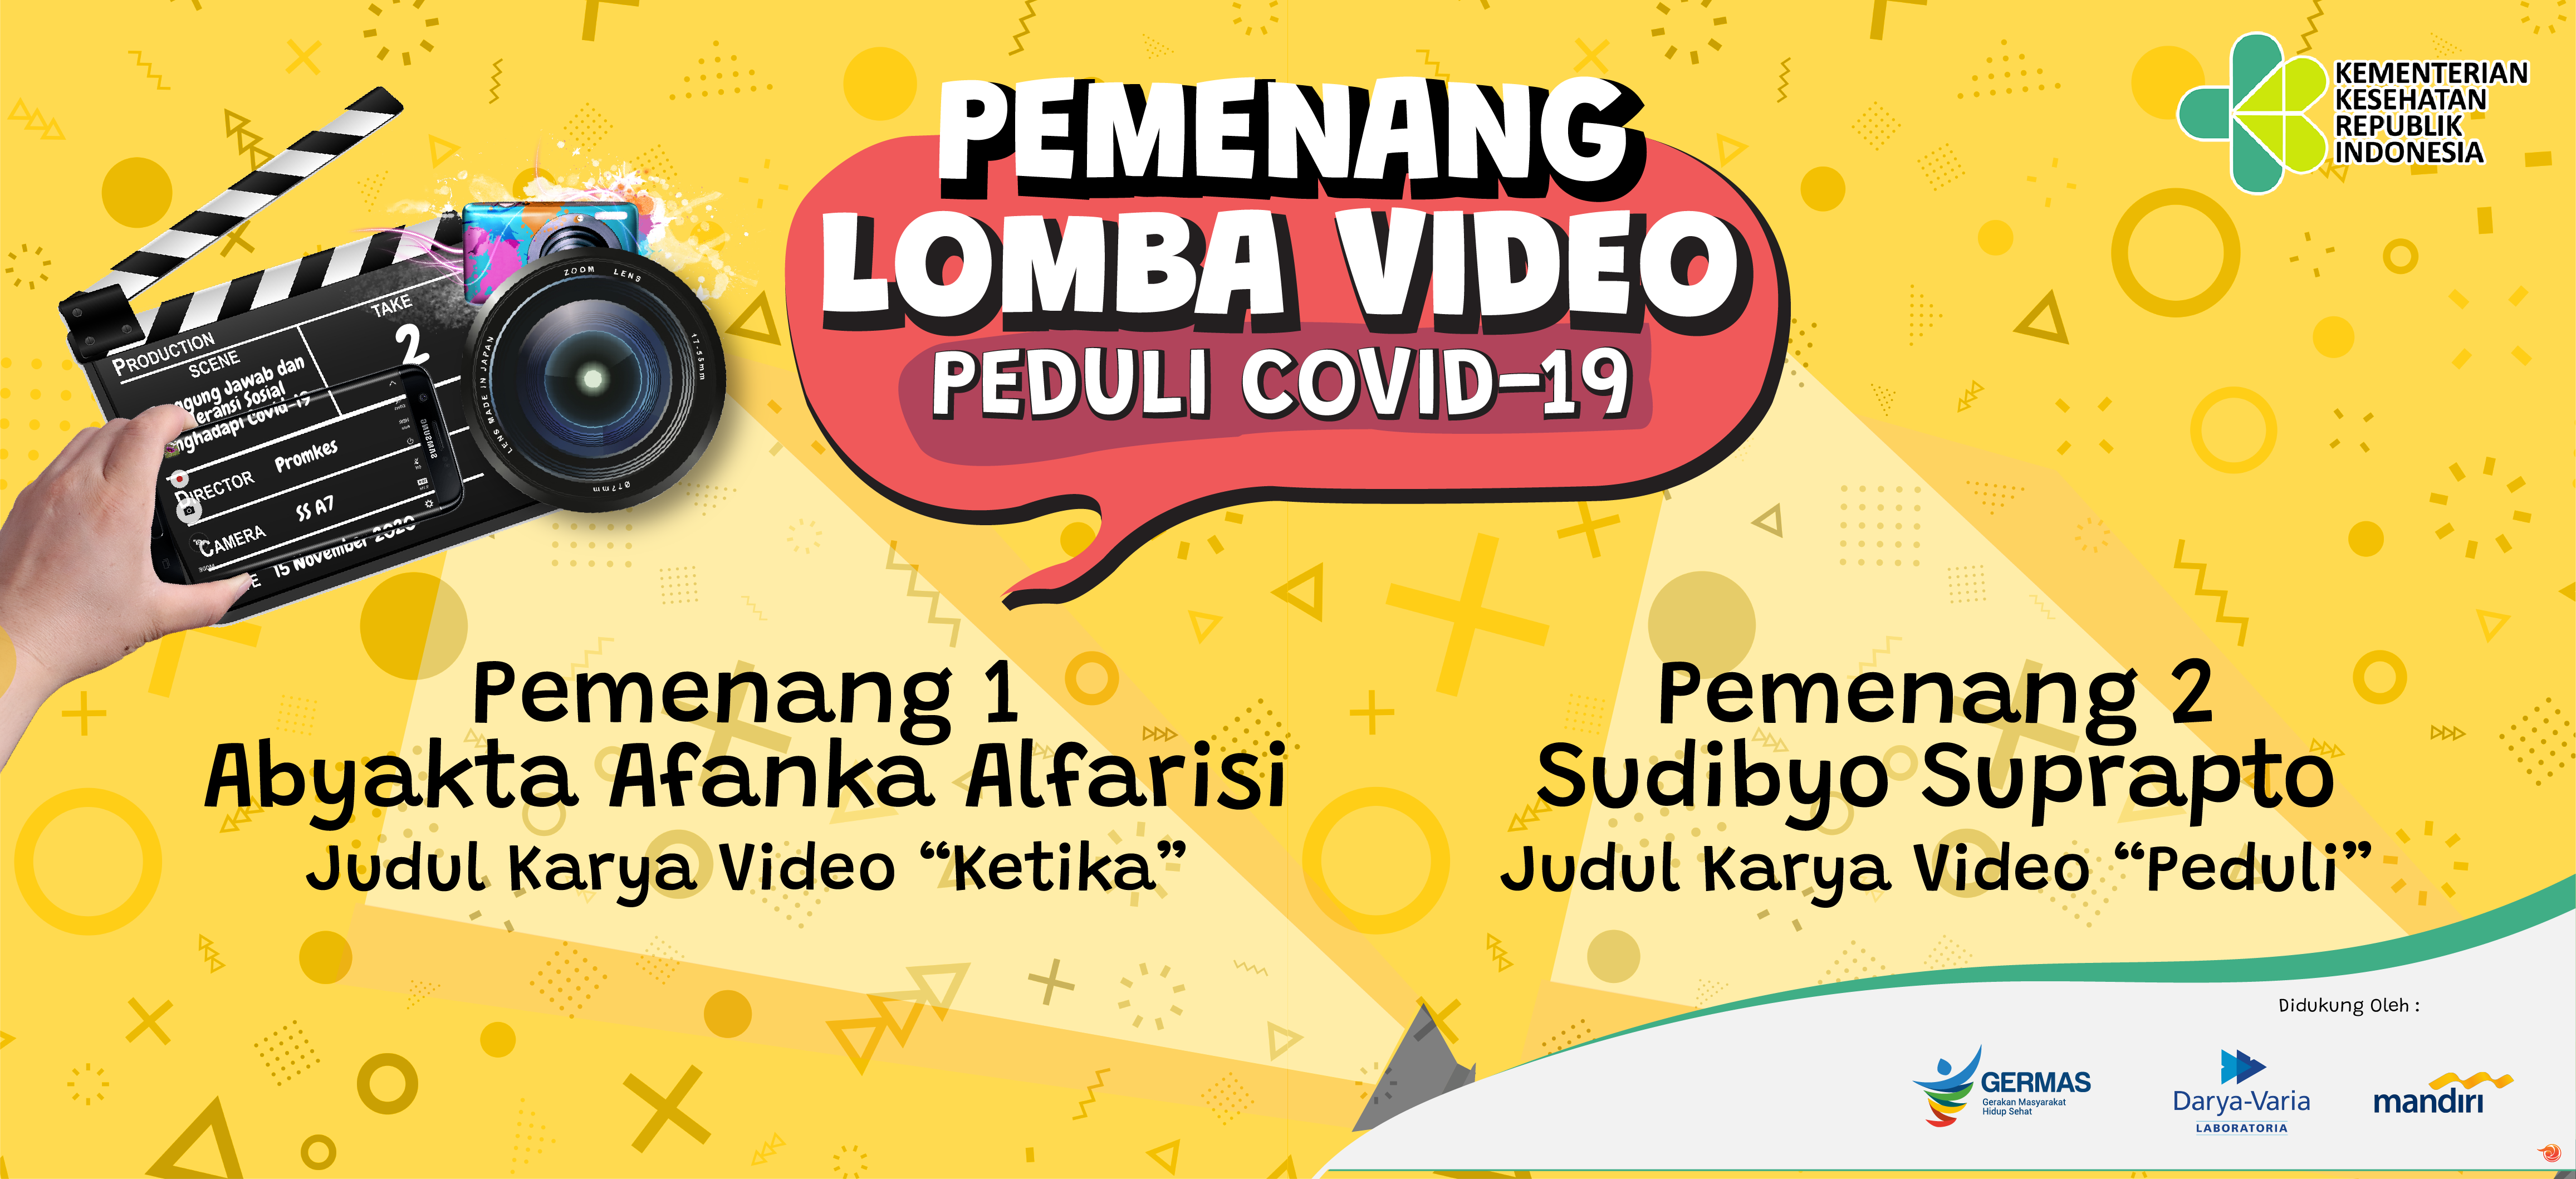 Lomba Video Promkes 2020